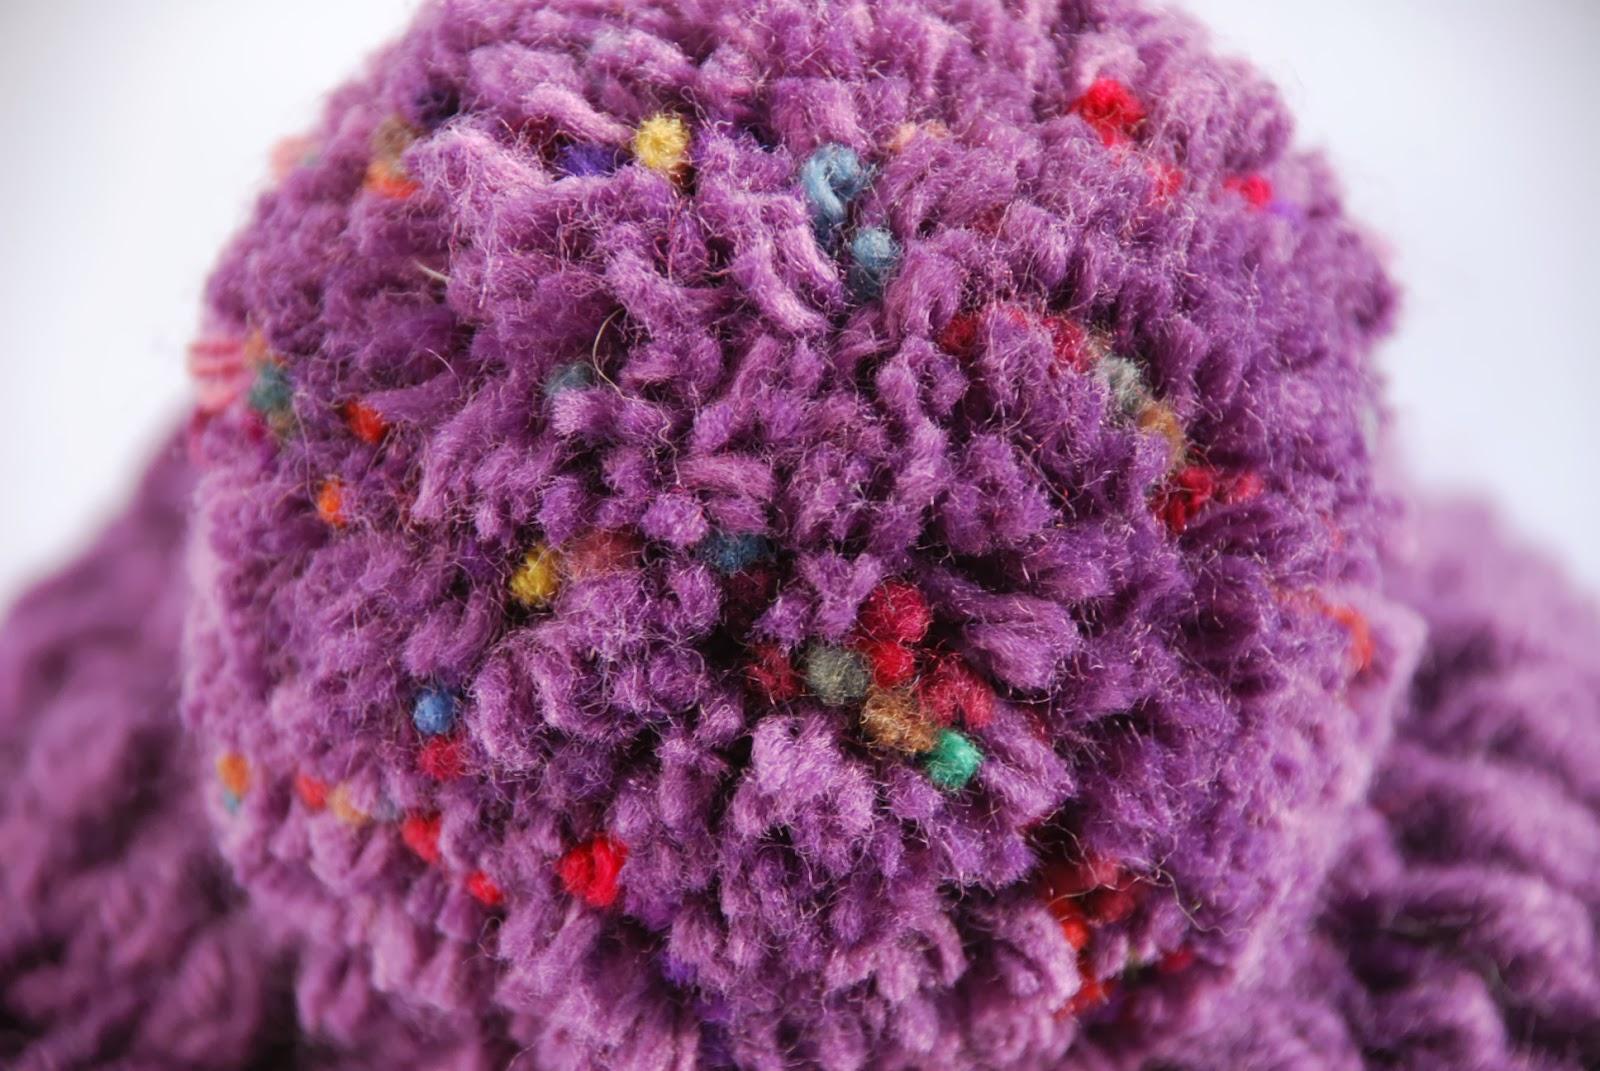 image of pom pom on crocheted hat